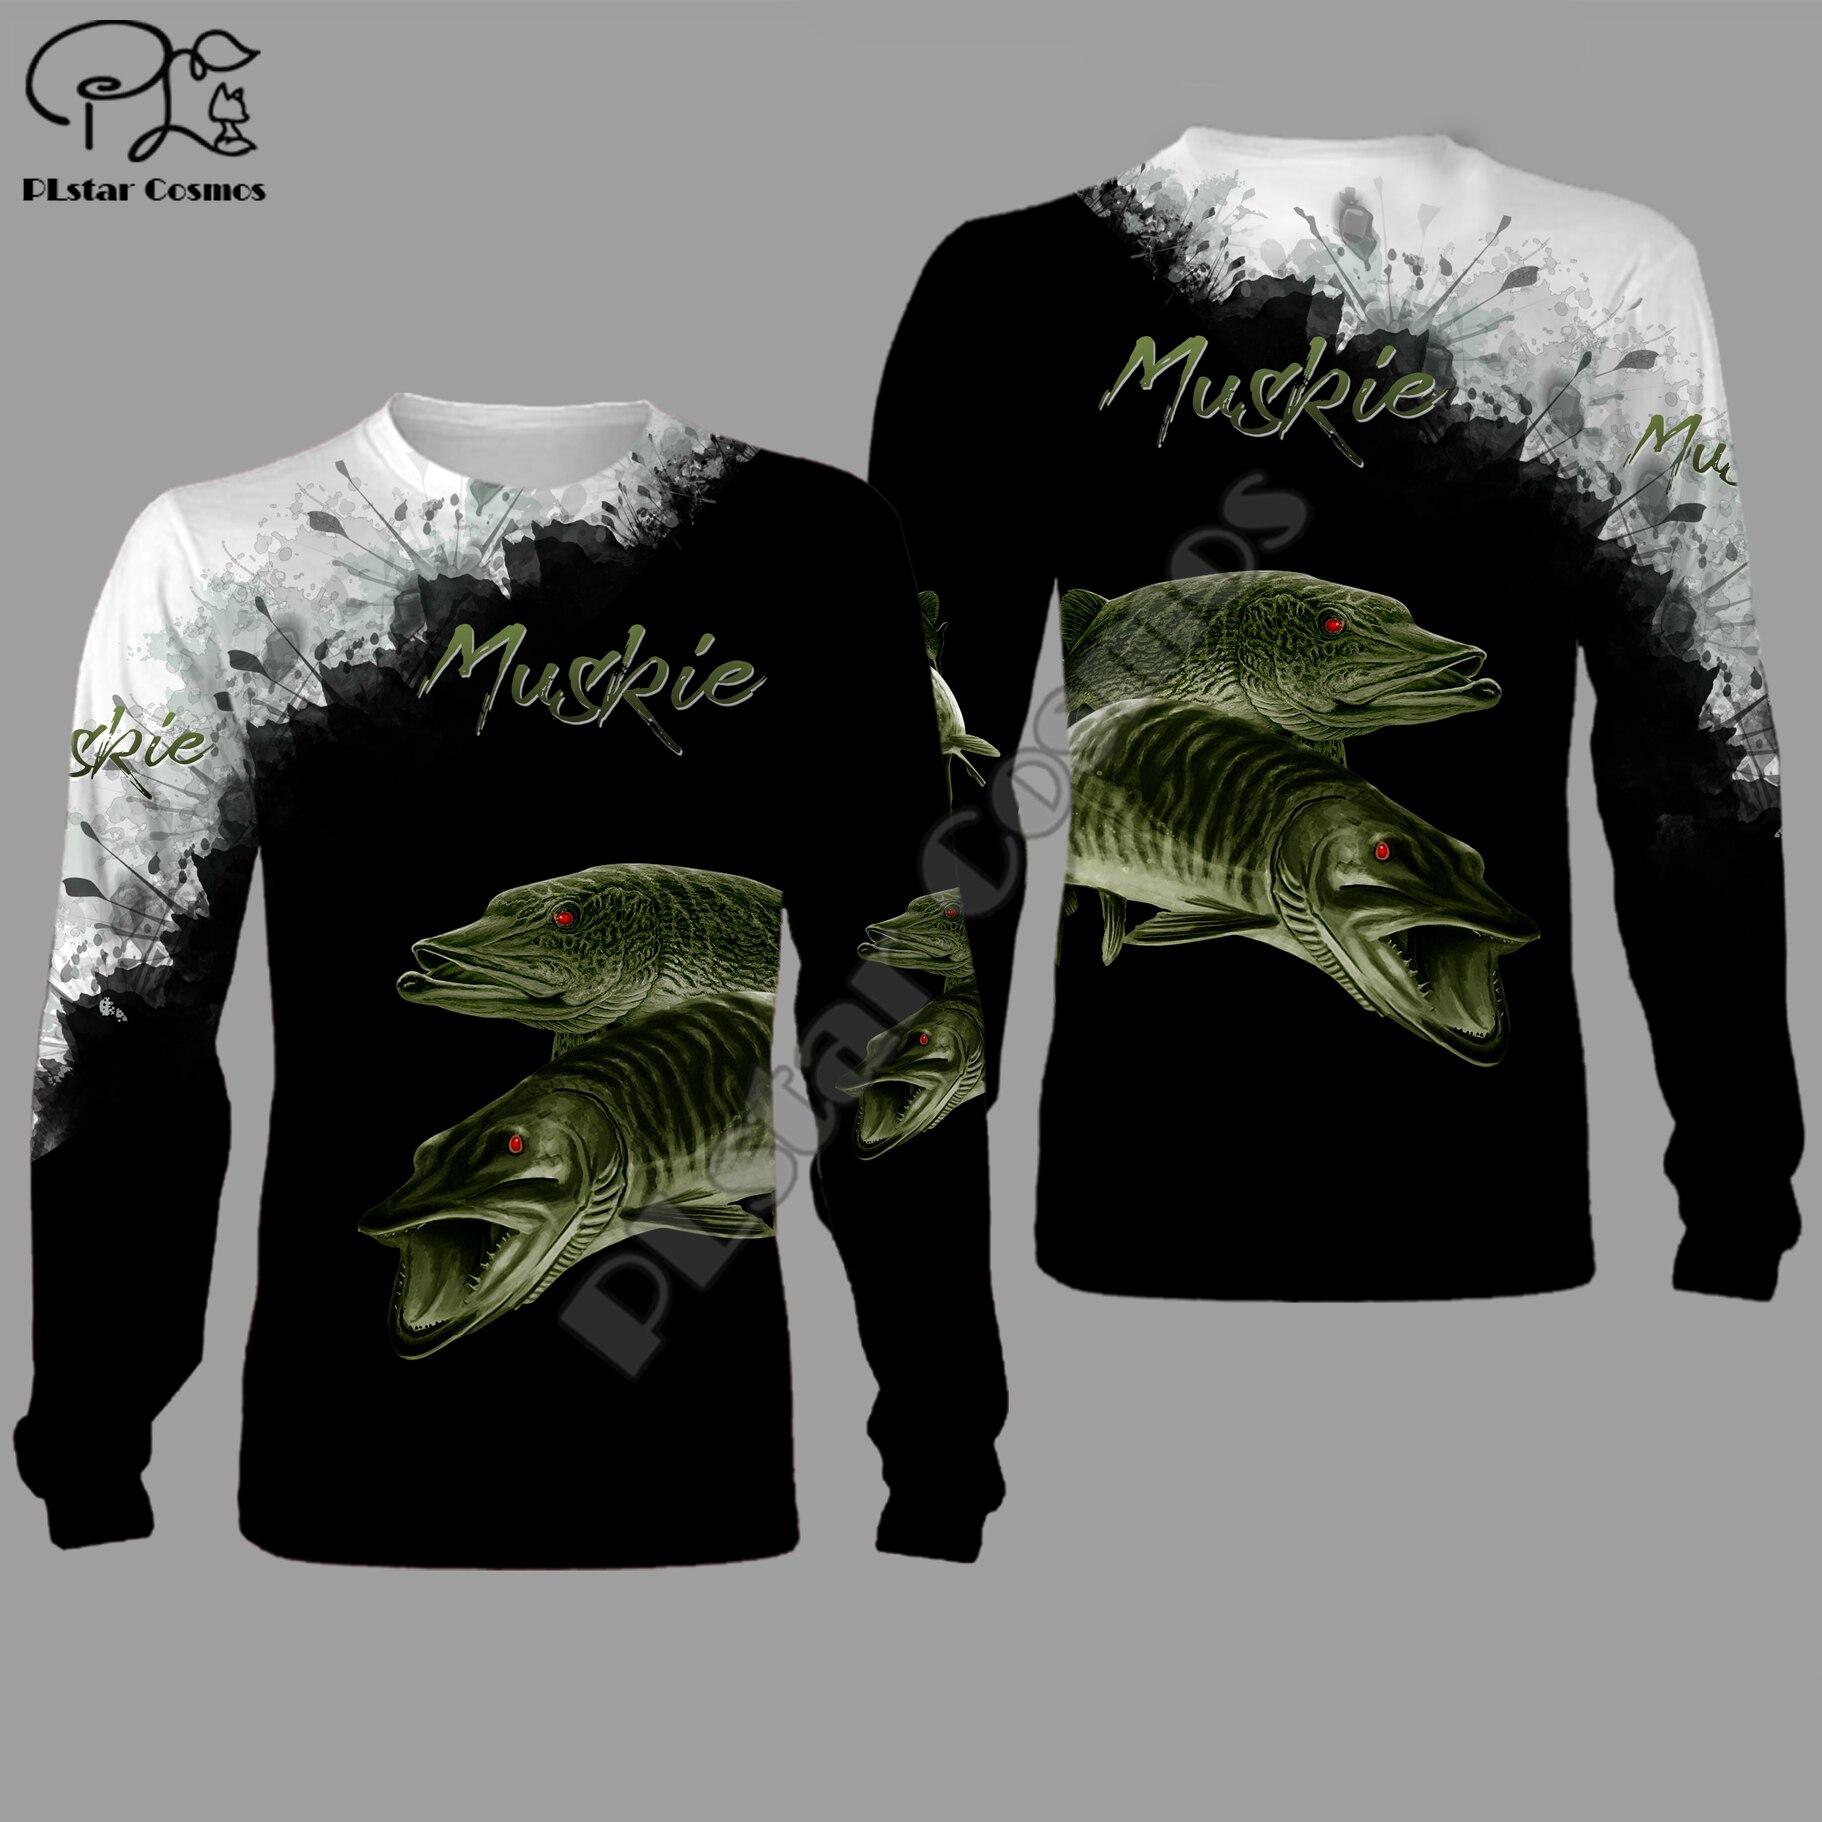 Muskie Fishing 3d All Over Printed Unisex Hoodies Harajuku Fashion Casual Hooded Sweatshirt Zip Hoodies